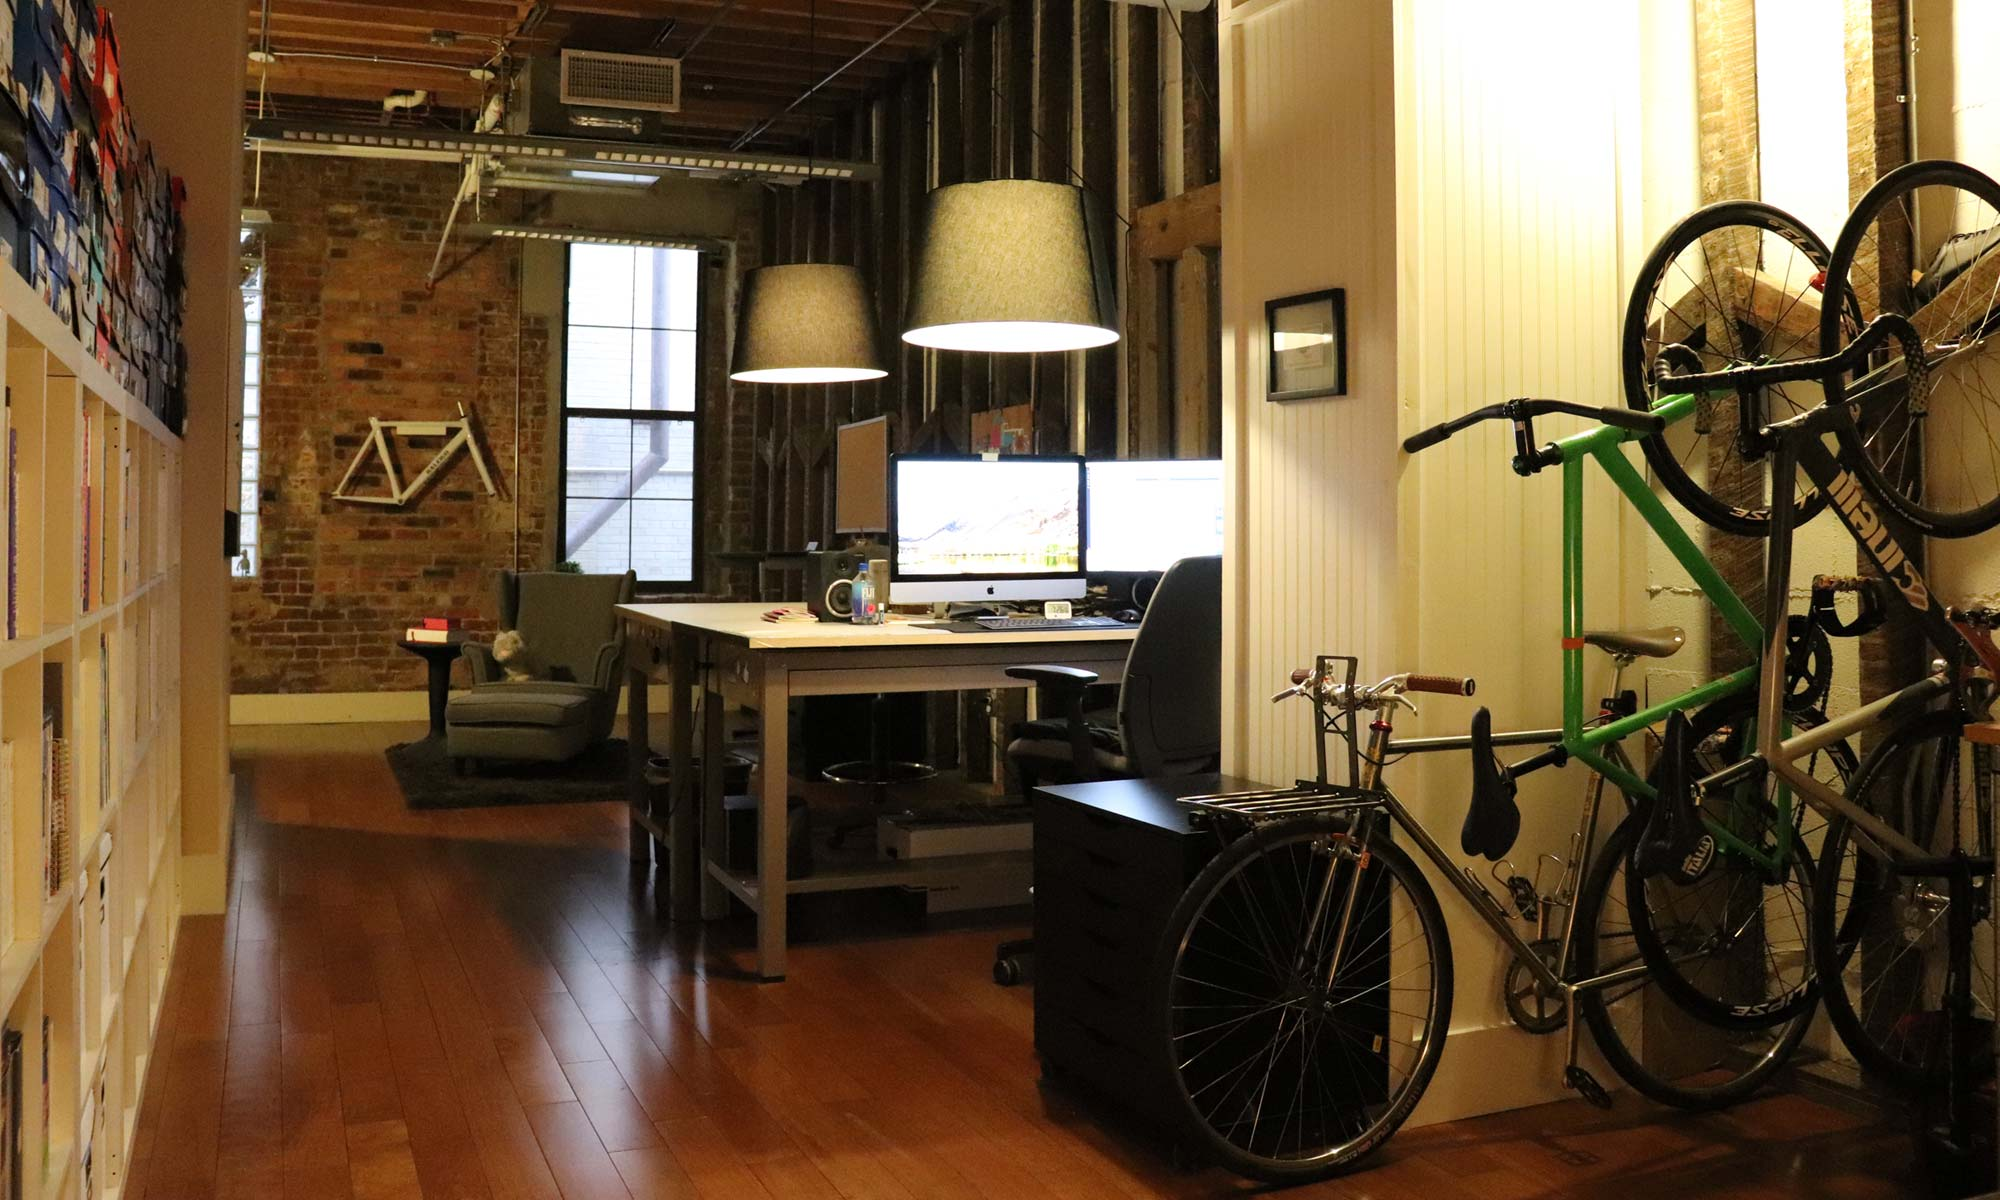 Design Business: My graphic design studio today, Richmond, VA (2018)